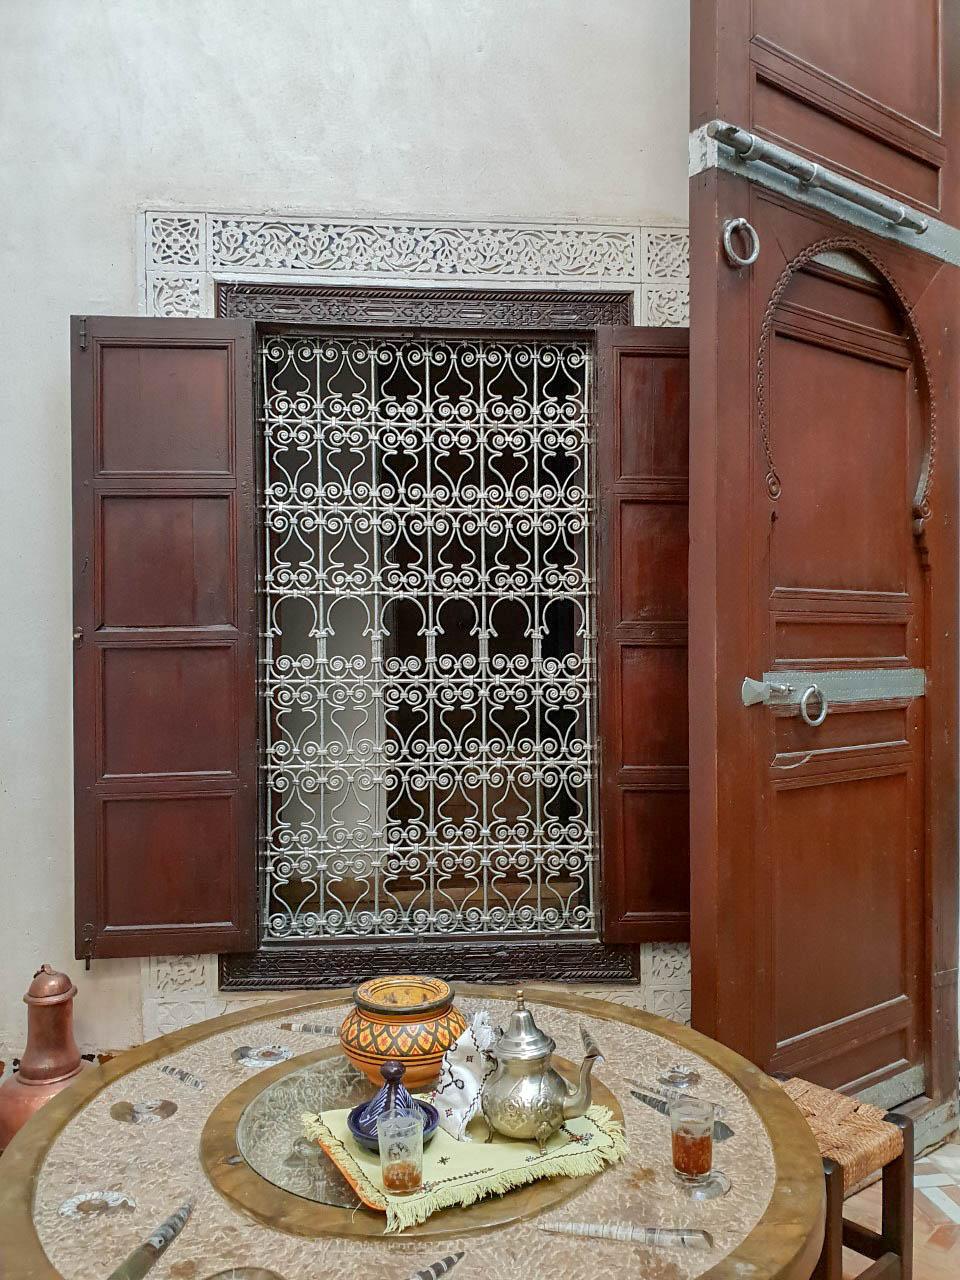 Riad Felloussia Meknes